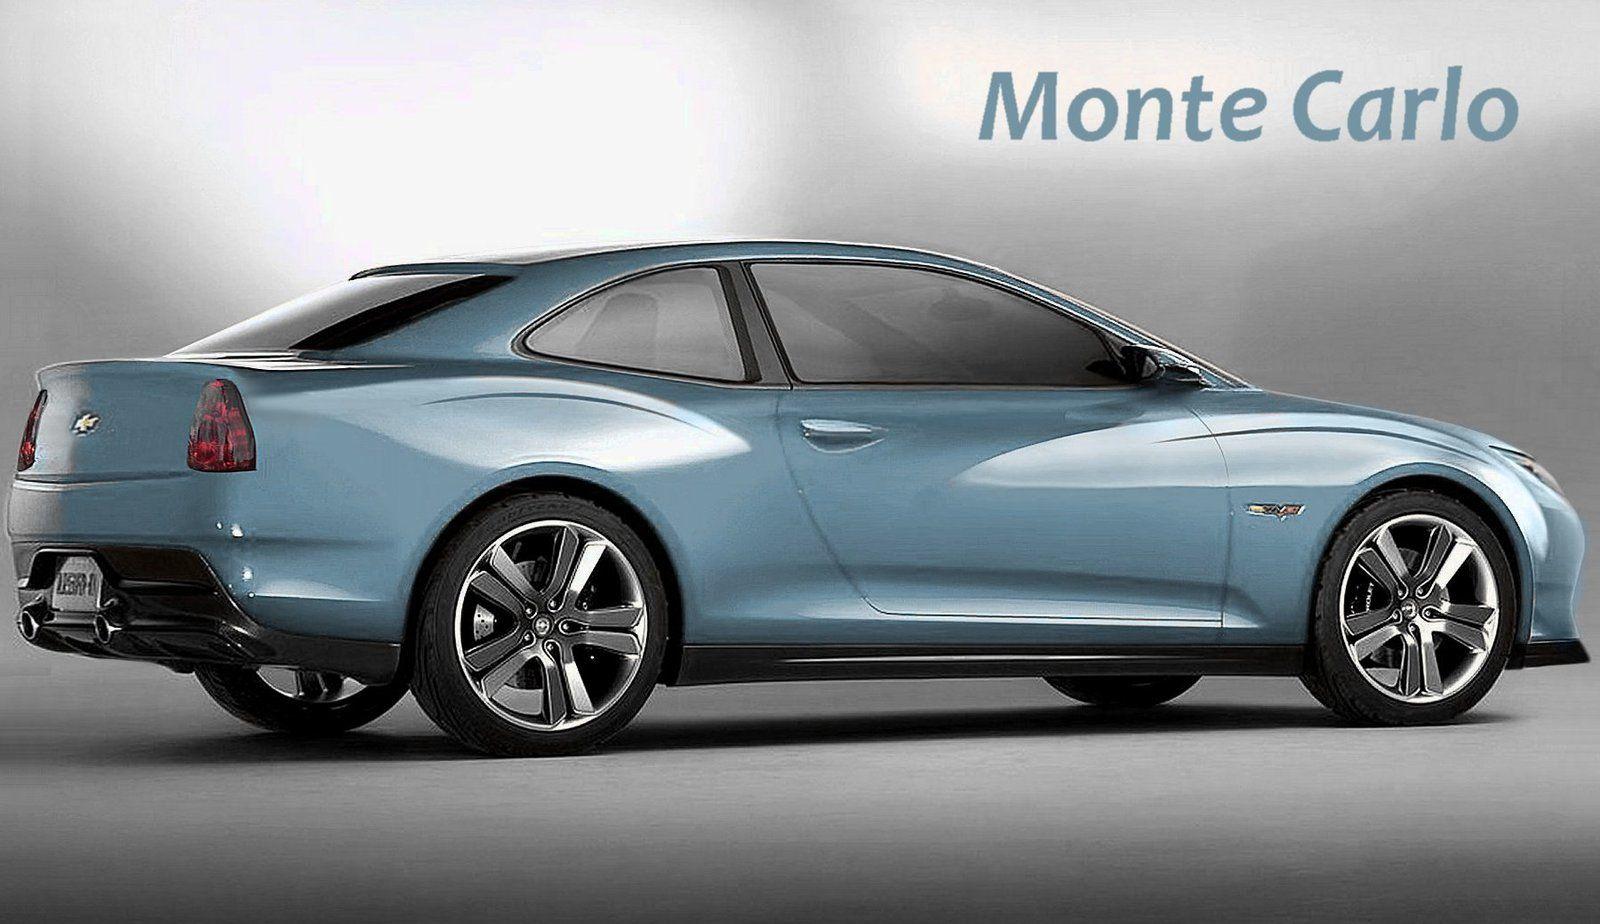 Chevy Monte Carlo 2015 >> 2015 Chevrolet Monte Carlo Please Let This Happen